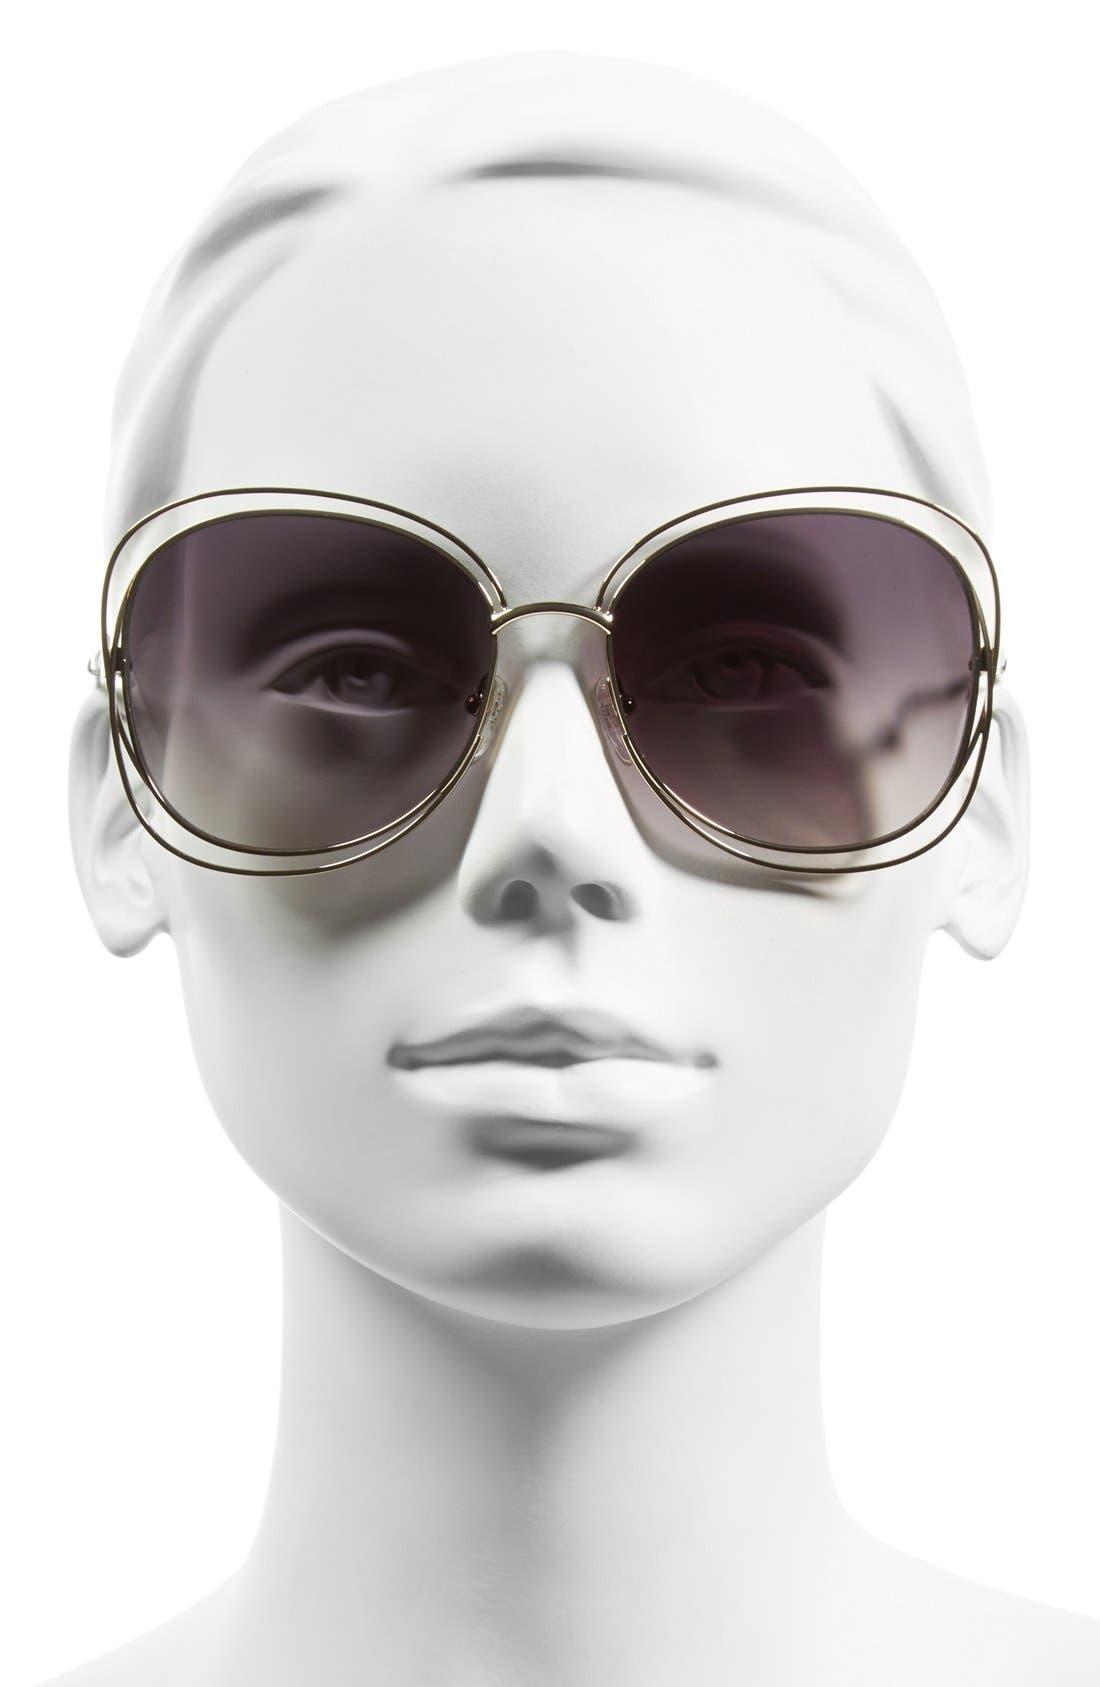 Carlina 60mm Gradient Les Sunglasses,                             Alternate thumbnail 2, color,                             GOLD/ LIGHT GREY